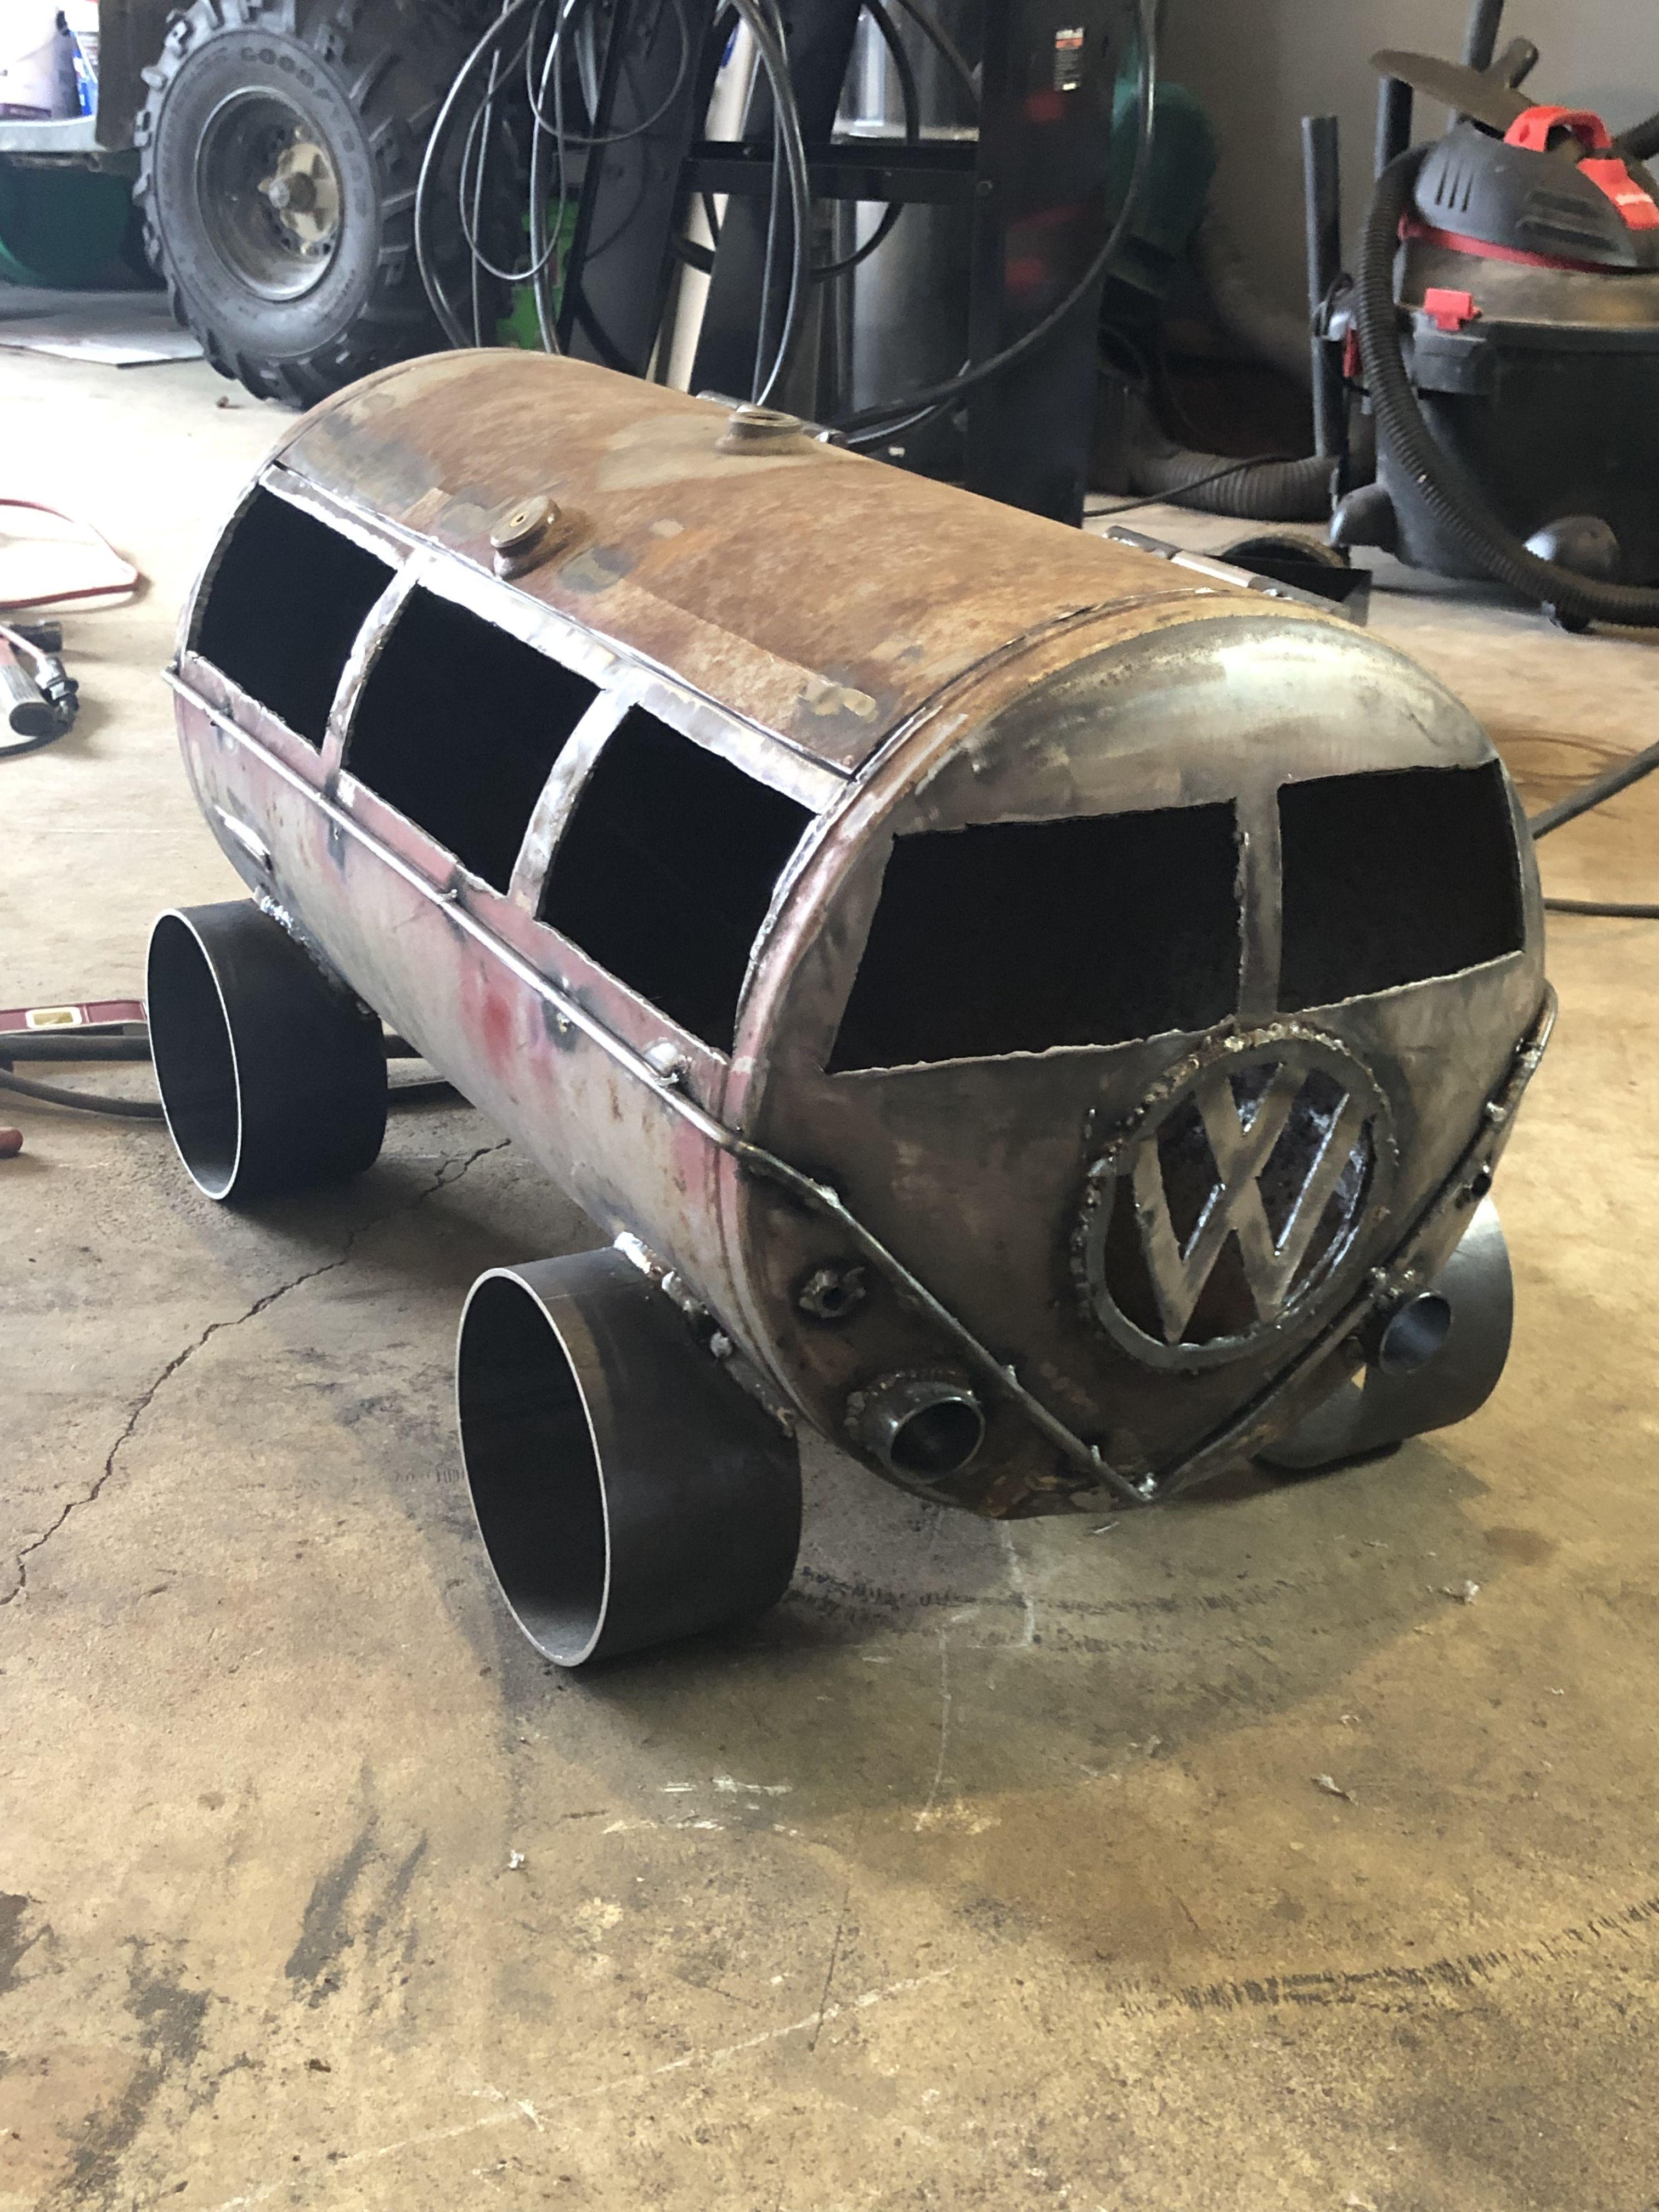 Pin by Dewey Jones on VW Bus air/propane tank Propane